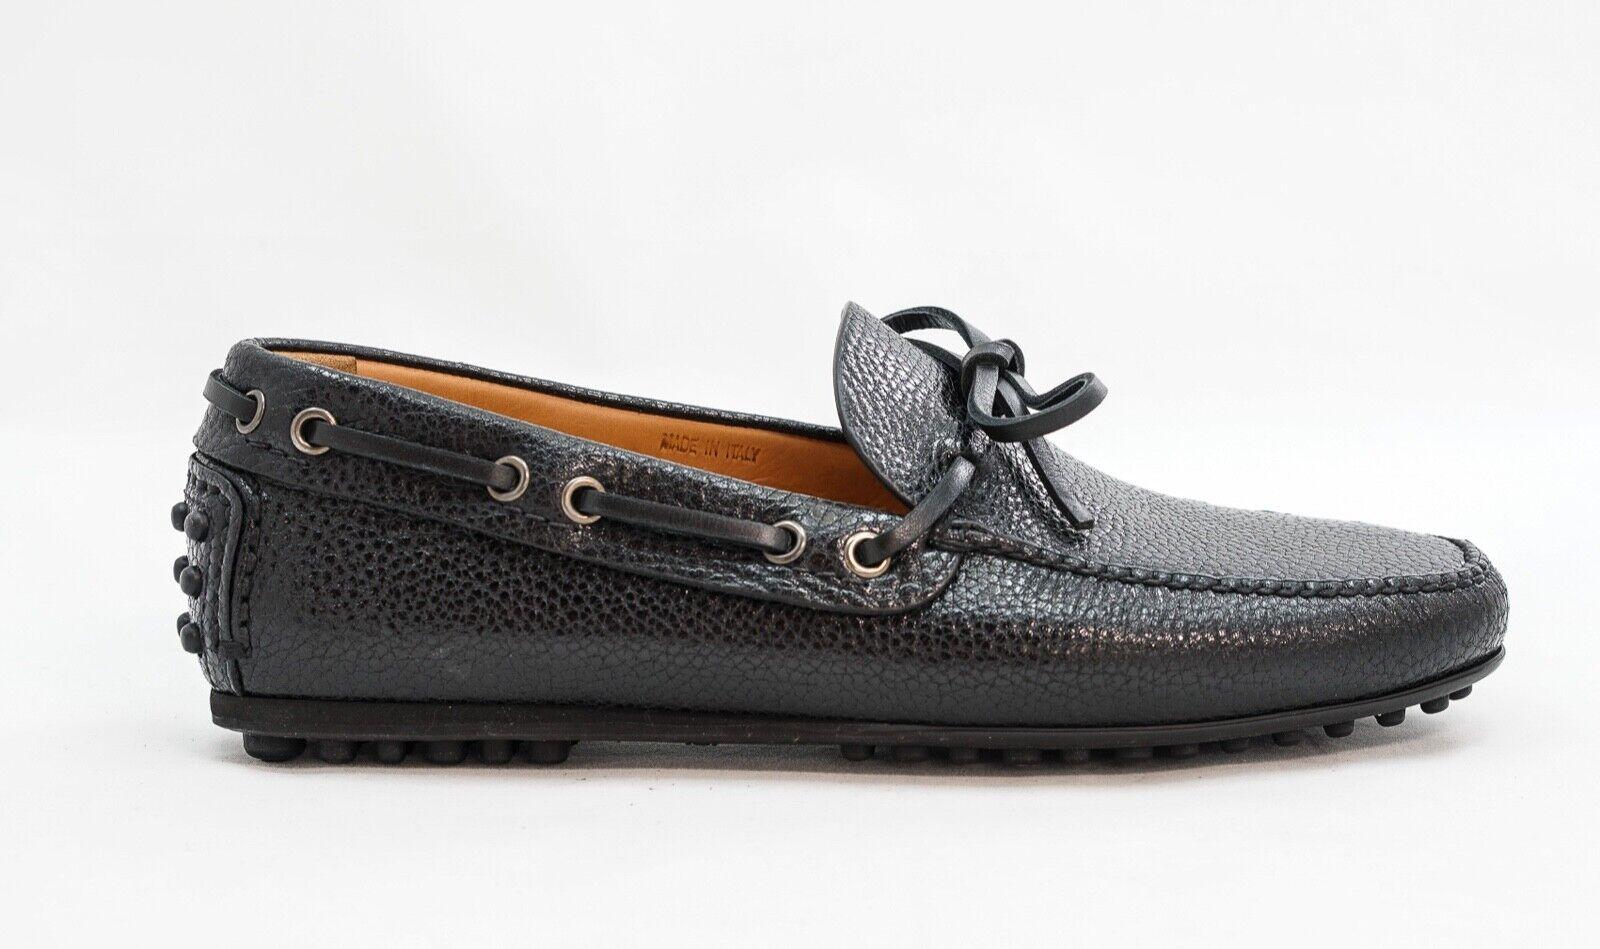 Calzado deportivo nuevo  grano negro masculino mocccasin kud600 talla 6   7us   40eu talla final